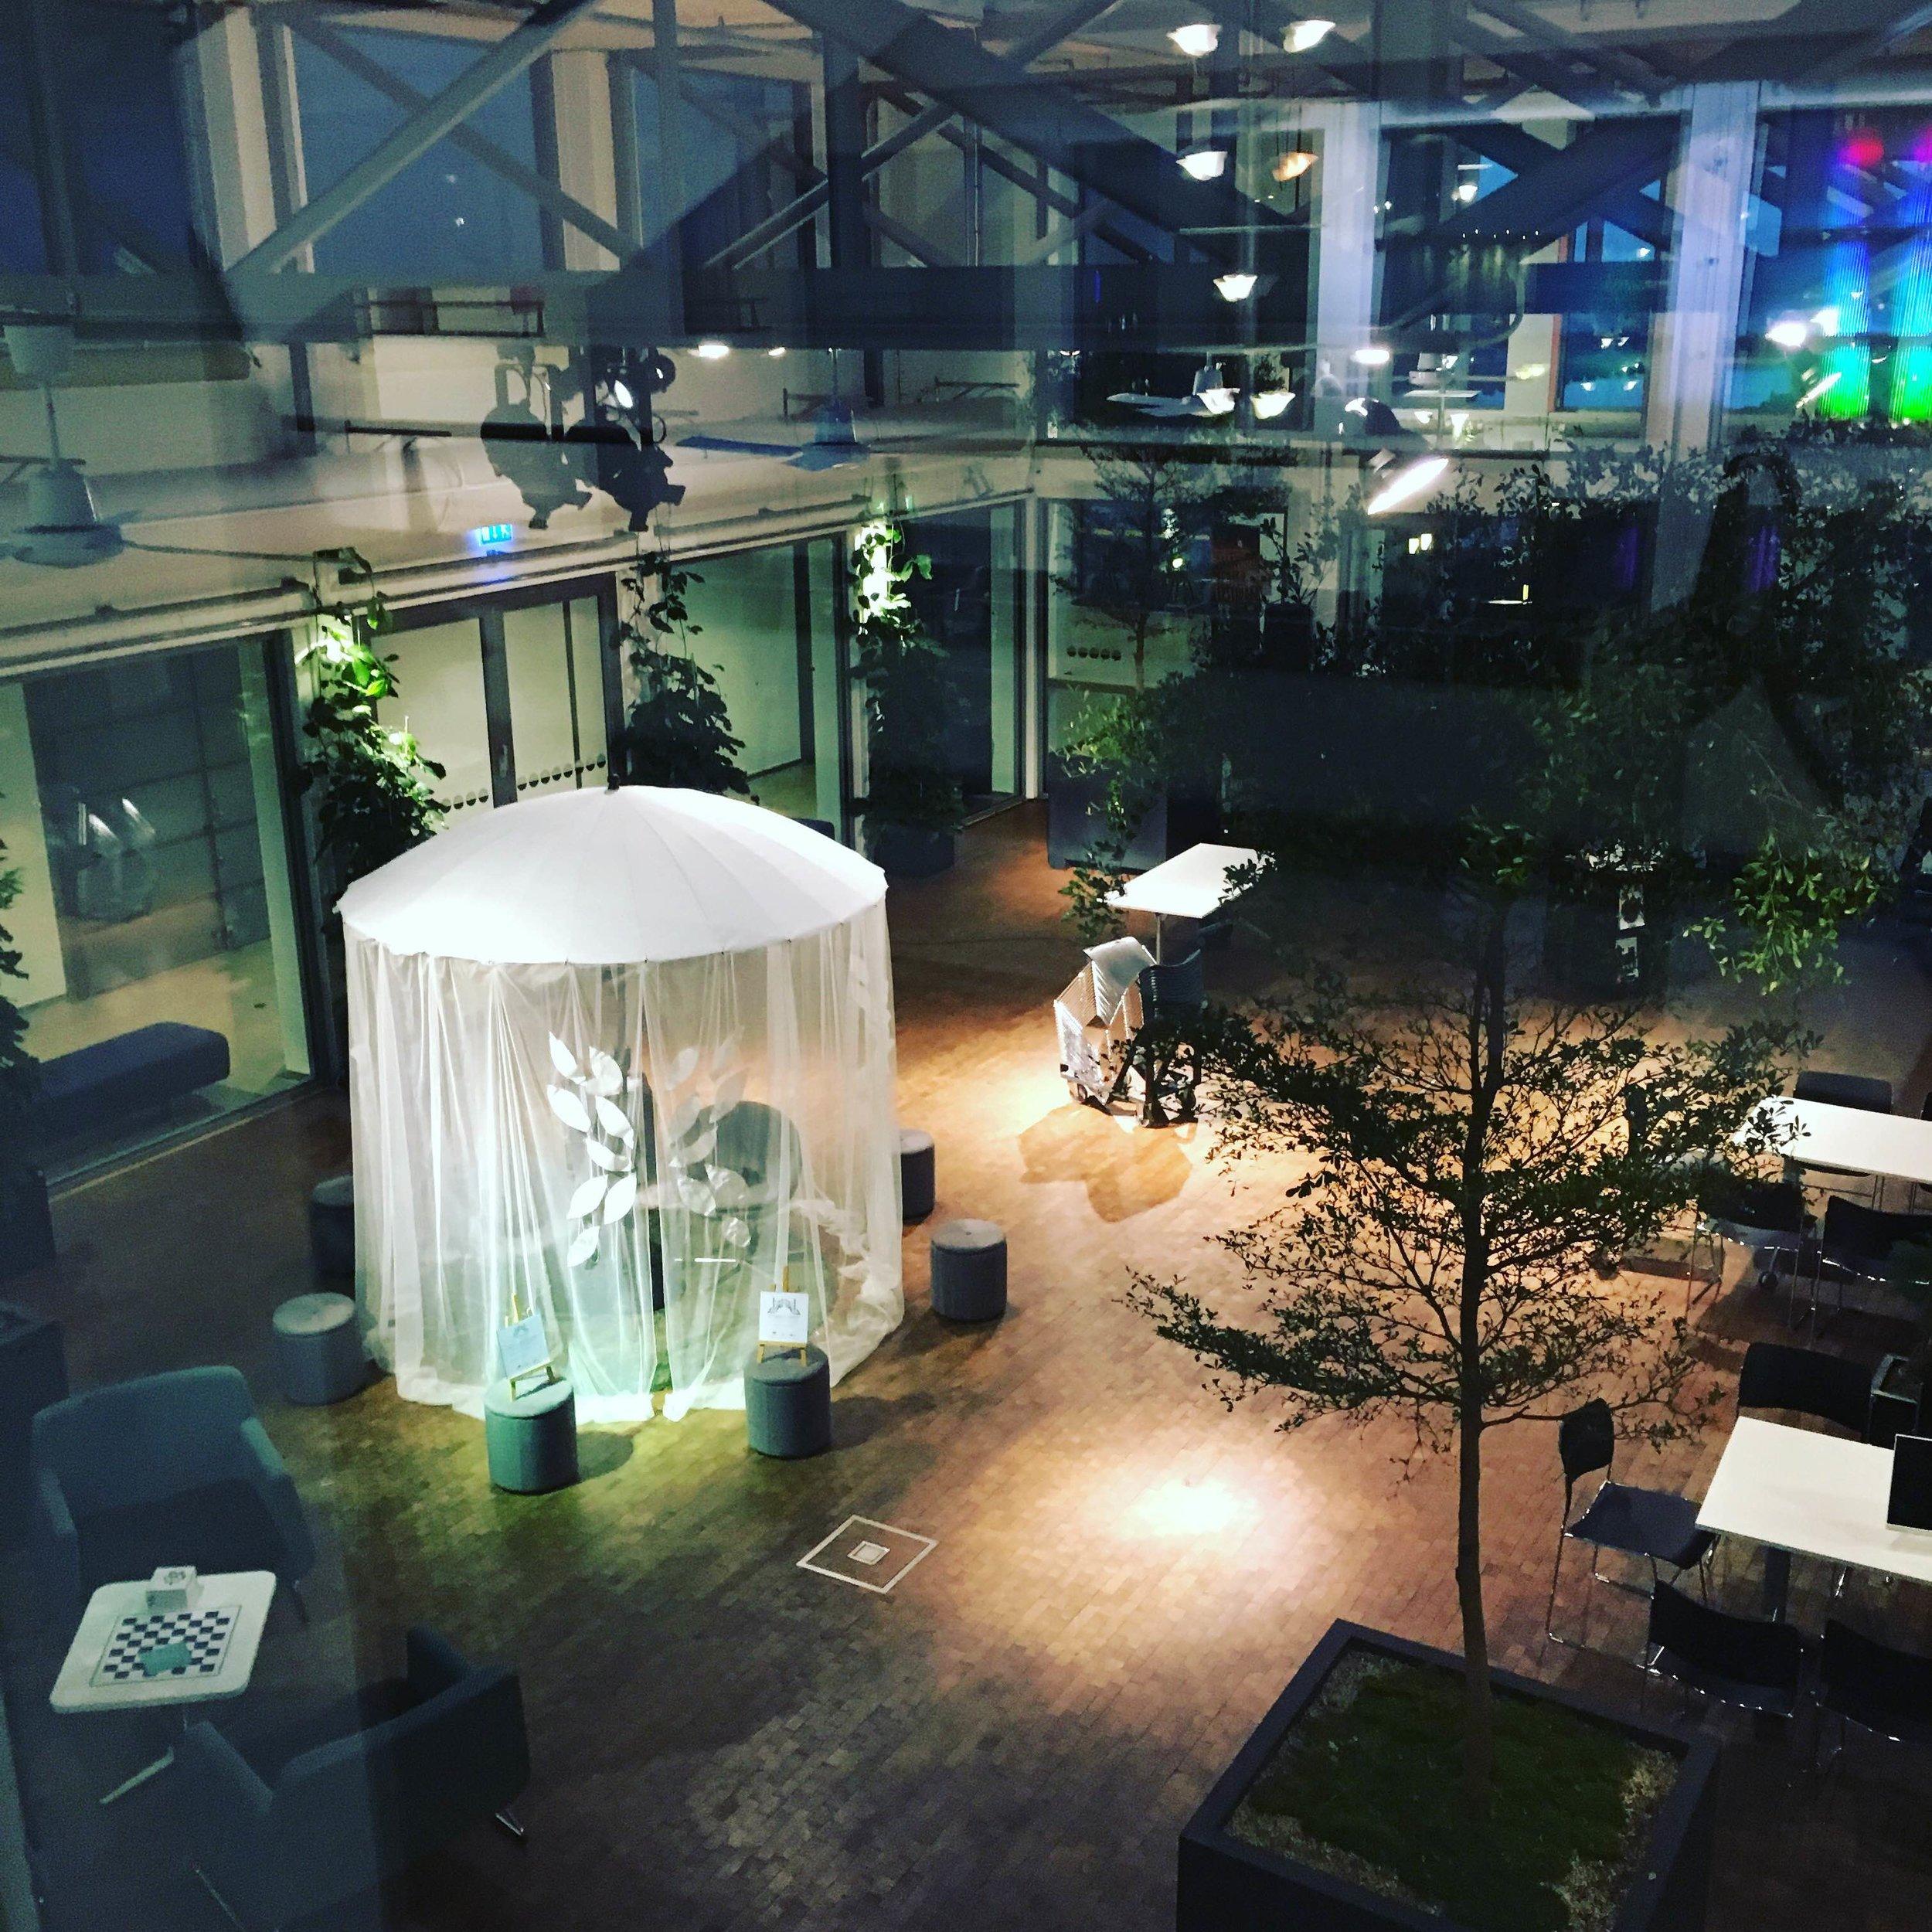 The garden of thoughts at Dunkers Kulturhus, Helsingborg on November 11, 2017.© Pernilla Belfrage